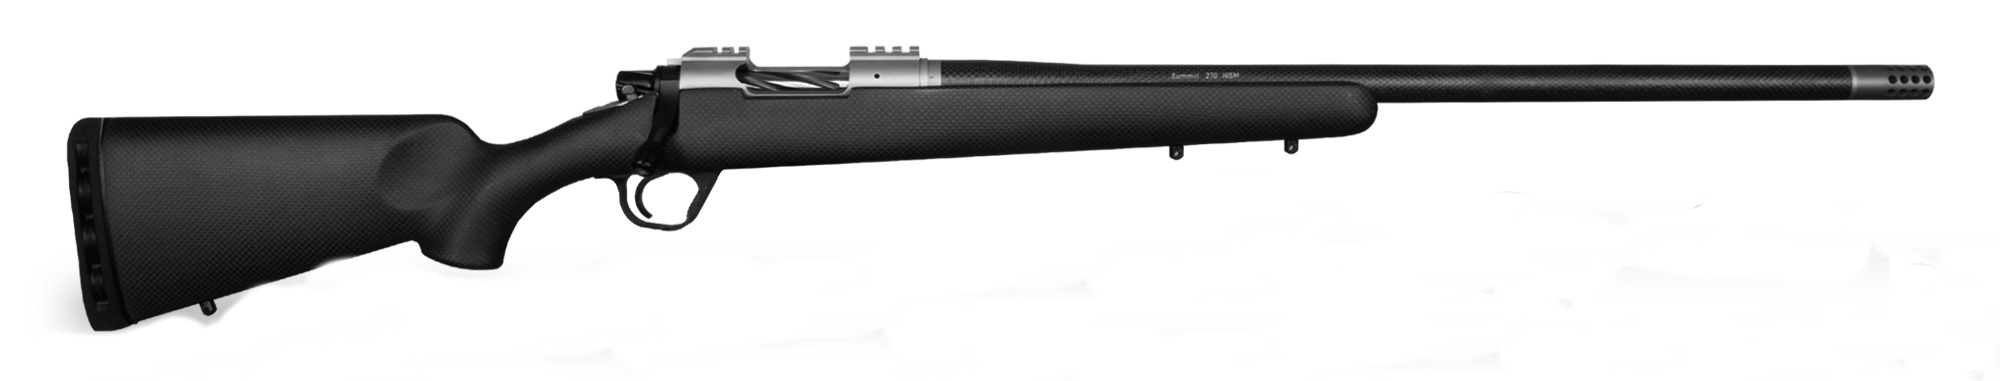 Christensen Arms Summit Ti 300 PRC